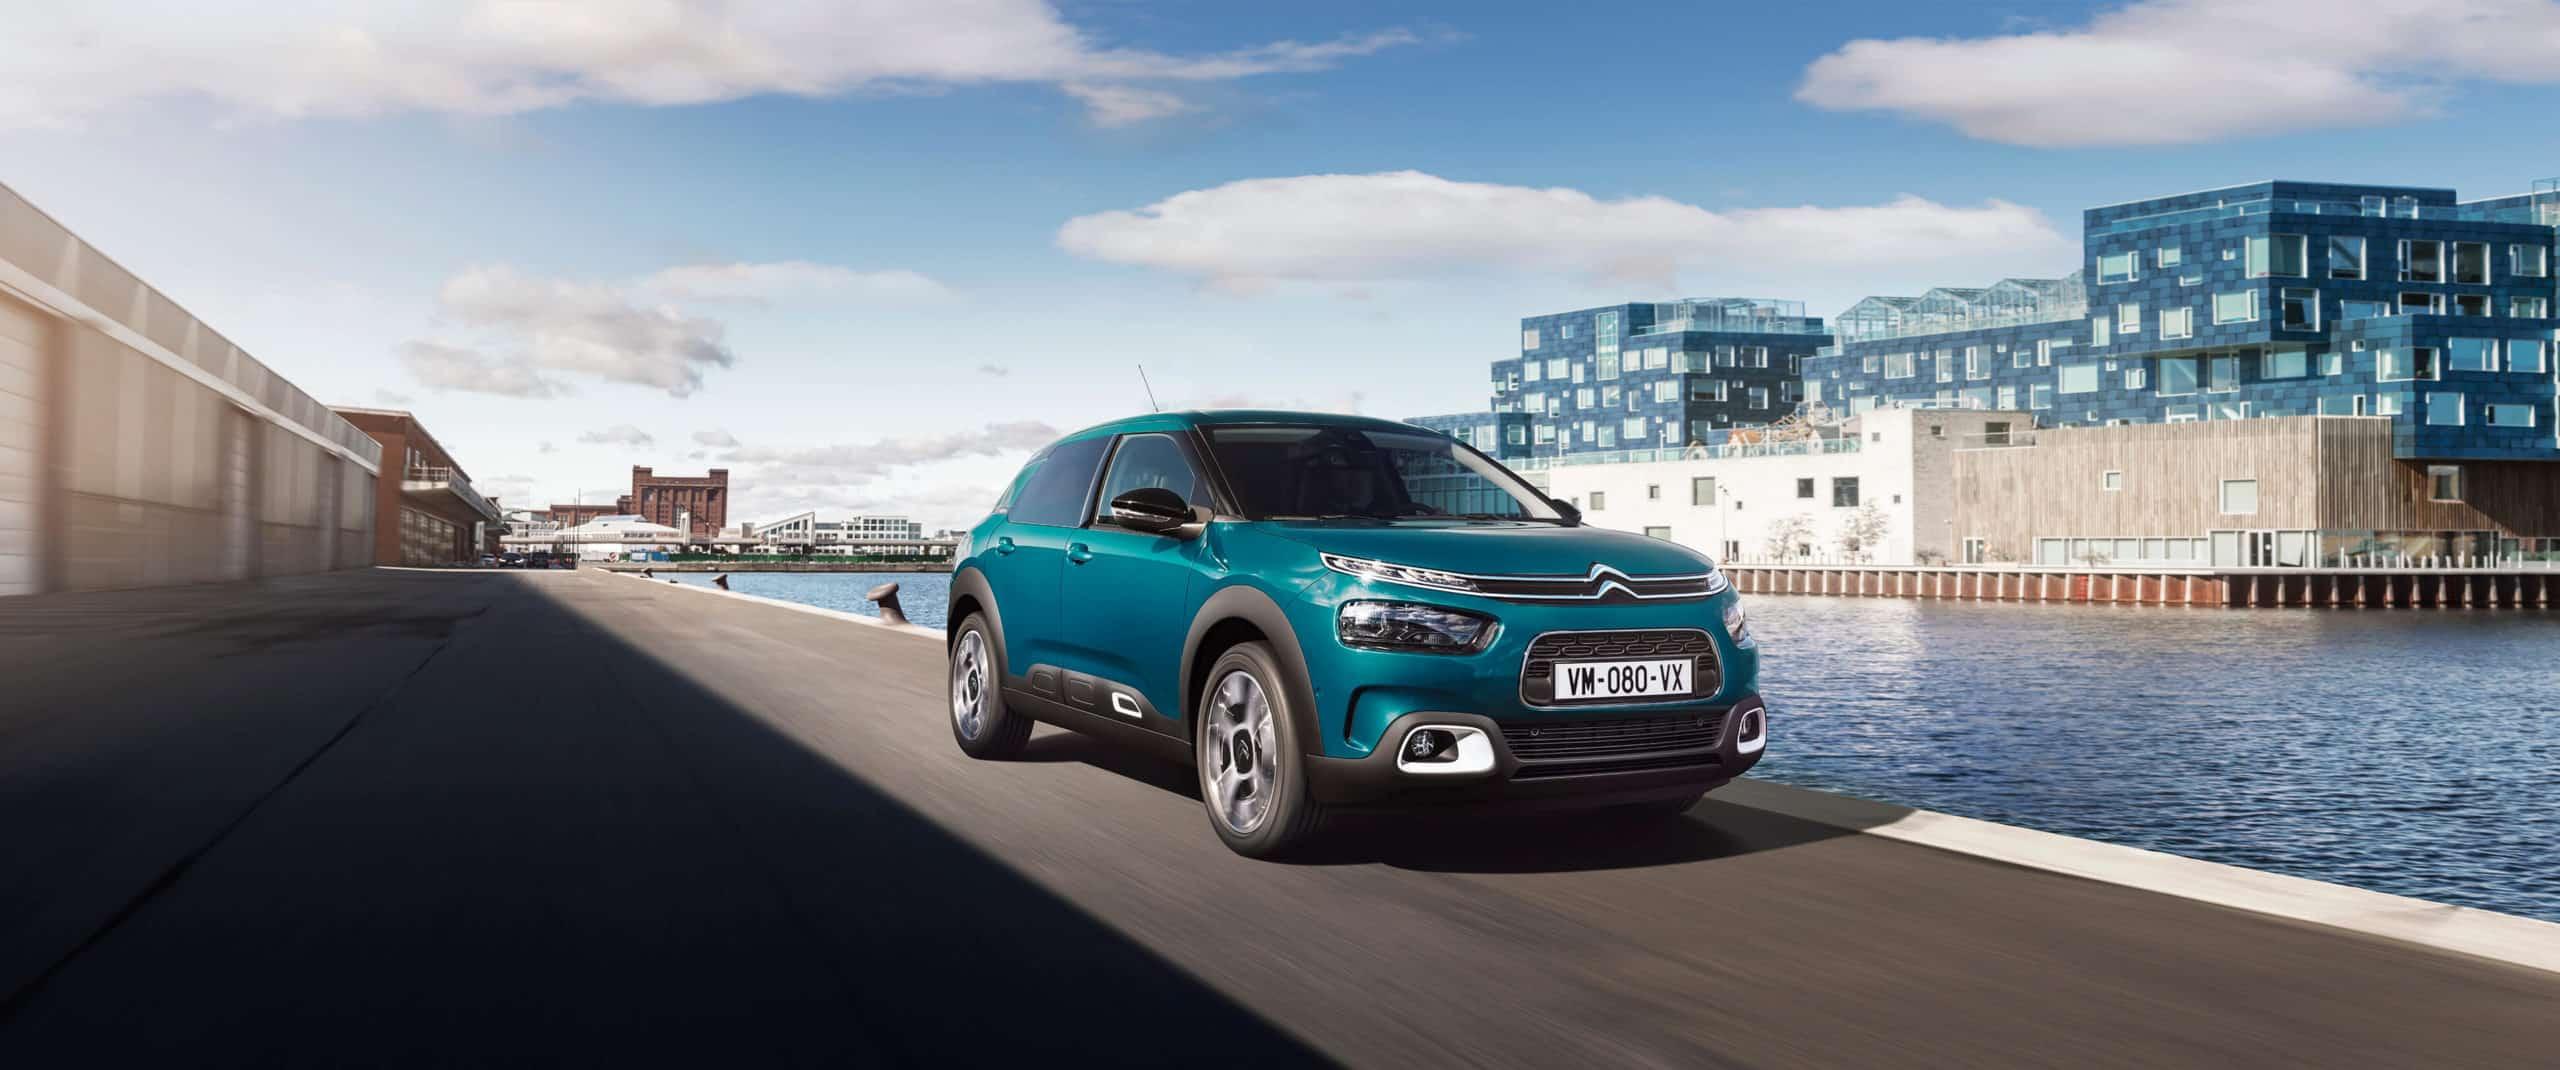 """Citroën"